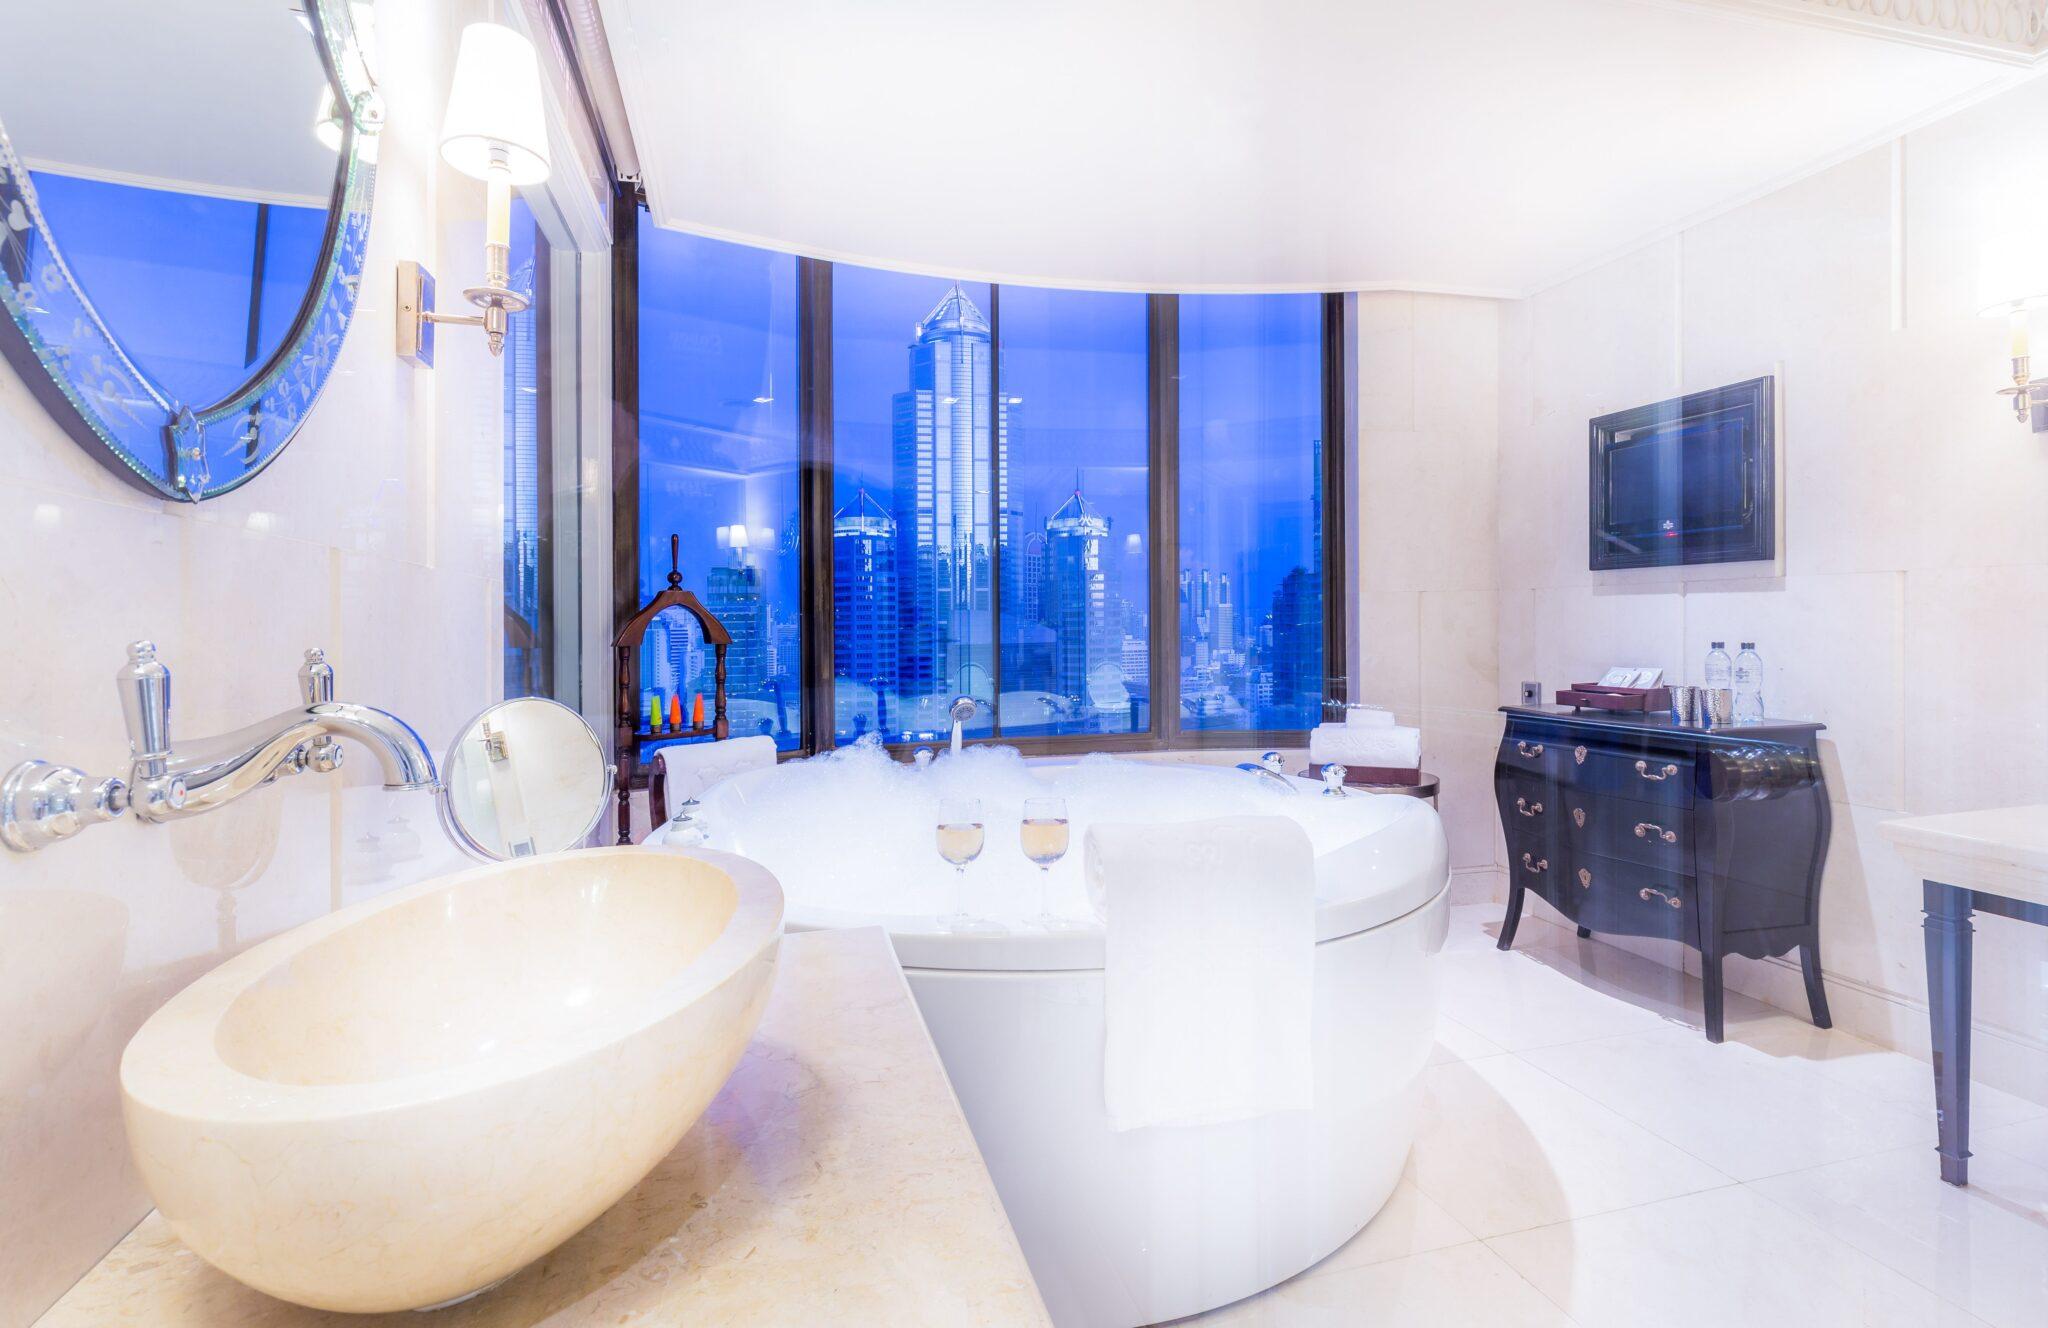 Paranim Penthouse Bathroom at Hotel Muse Bangkok Thailand